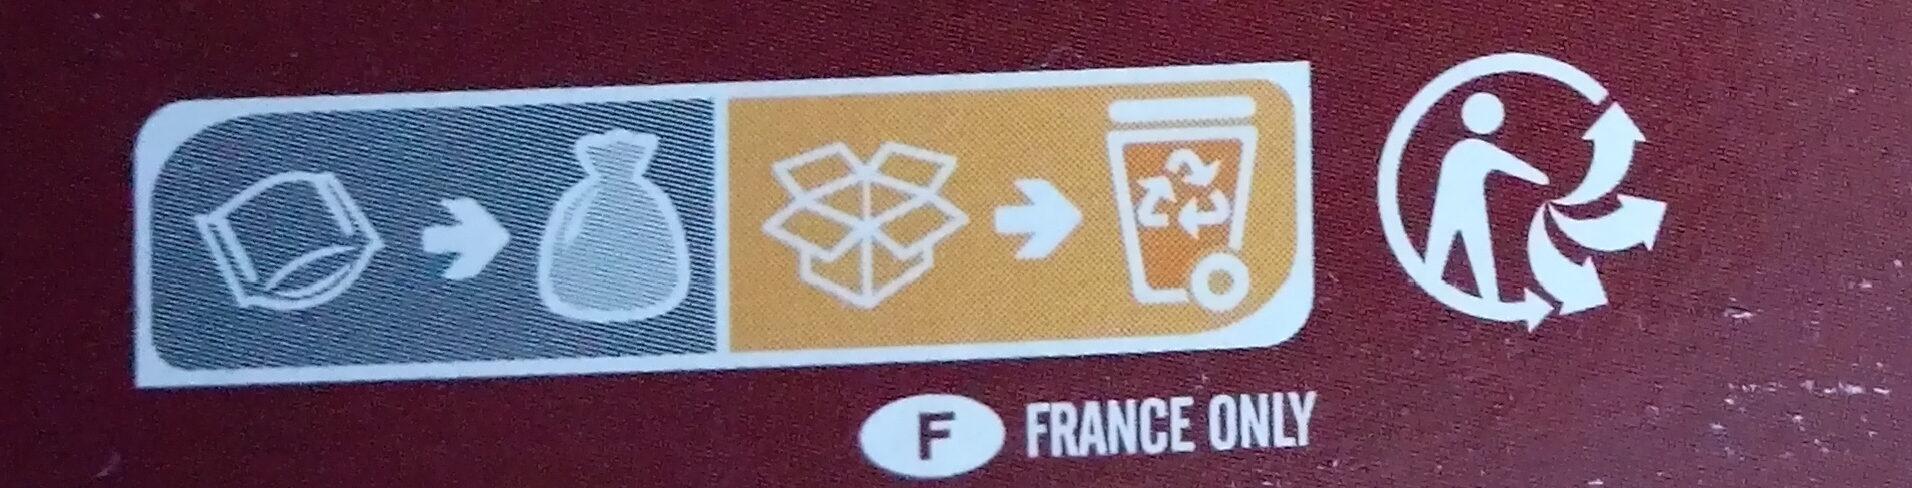 Galettes de fèves & blé patate douce, dattes et épices douces - Istruzioni per il riciclaggio e/o informazioni sull'imballaggio - fr